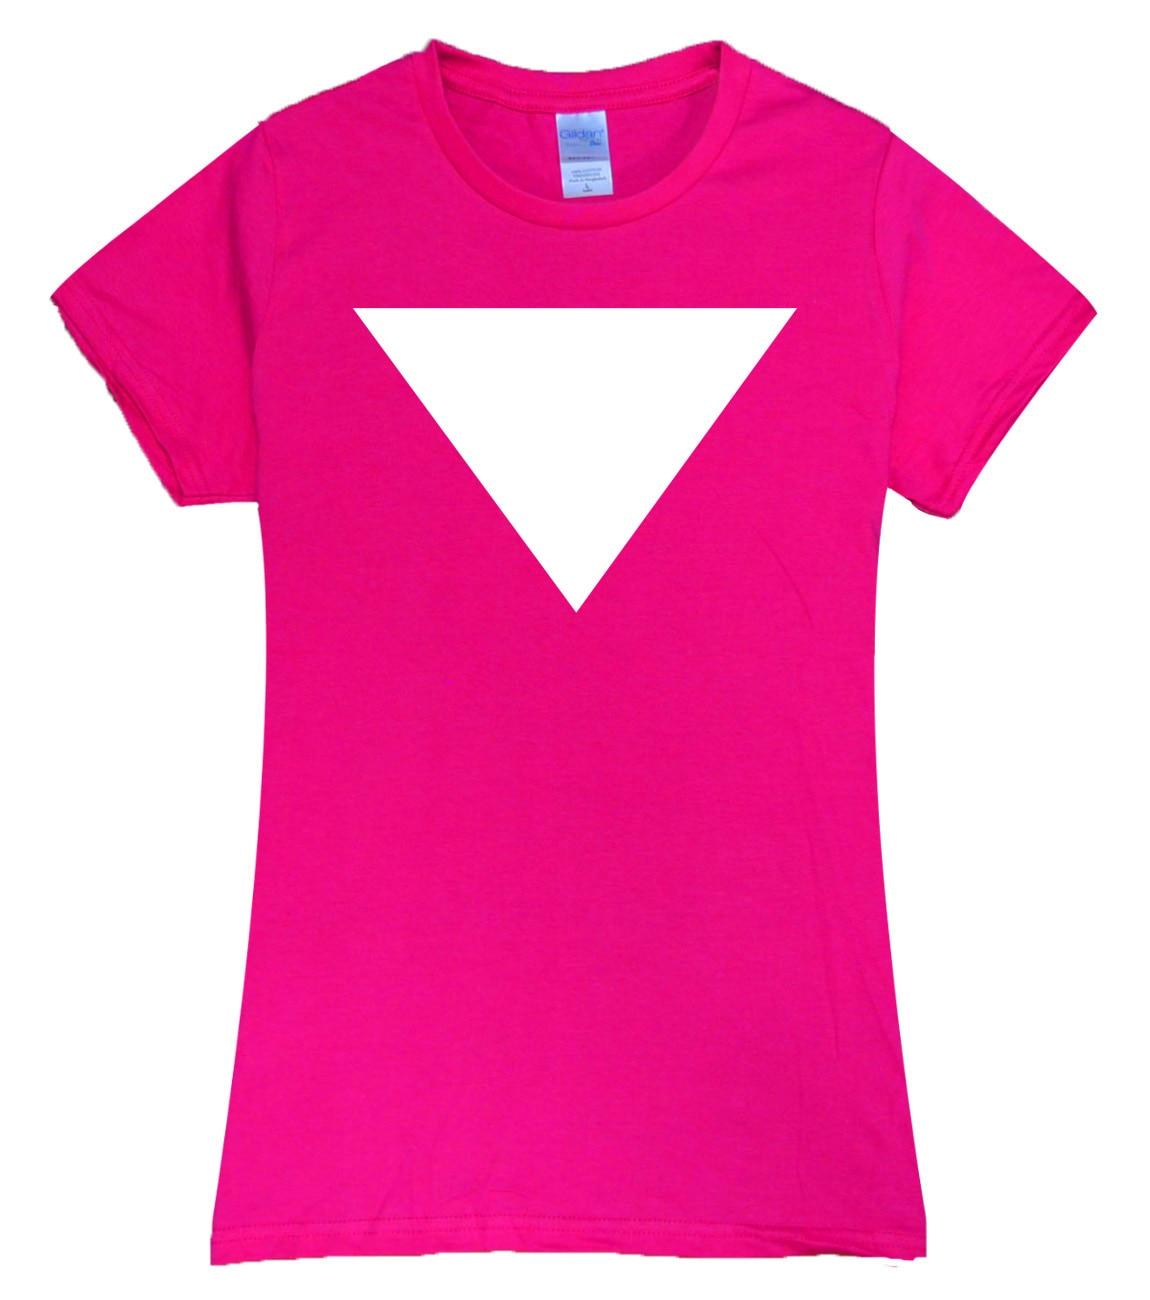 Triangle graphich funny Print Women Cotton t shirt brand hot sale streetwear harajuku pink shirt grunge